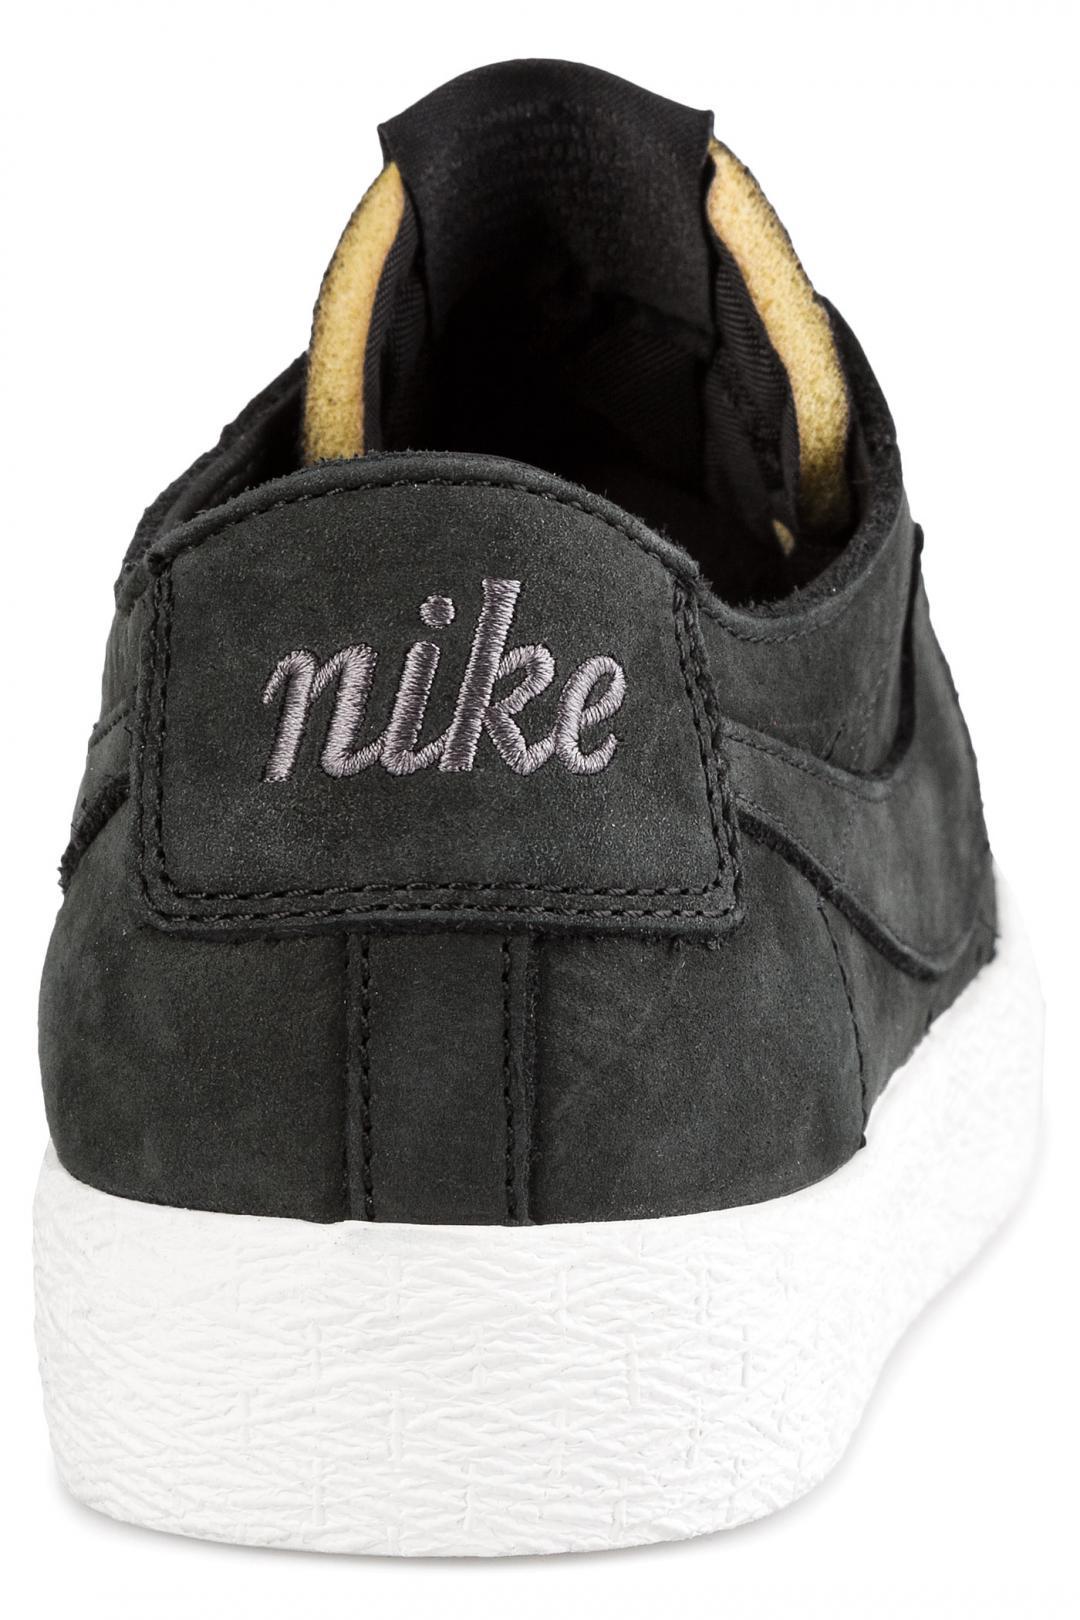 Uomo Nike SB Zoom Blazer Low Deconstructed black anthracite | Sneakers low top